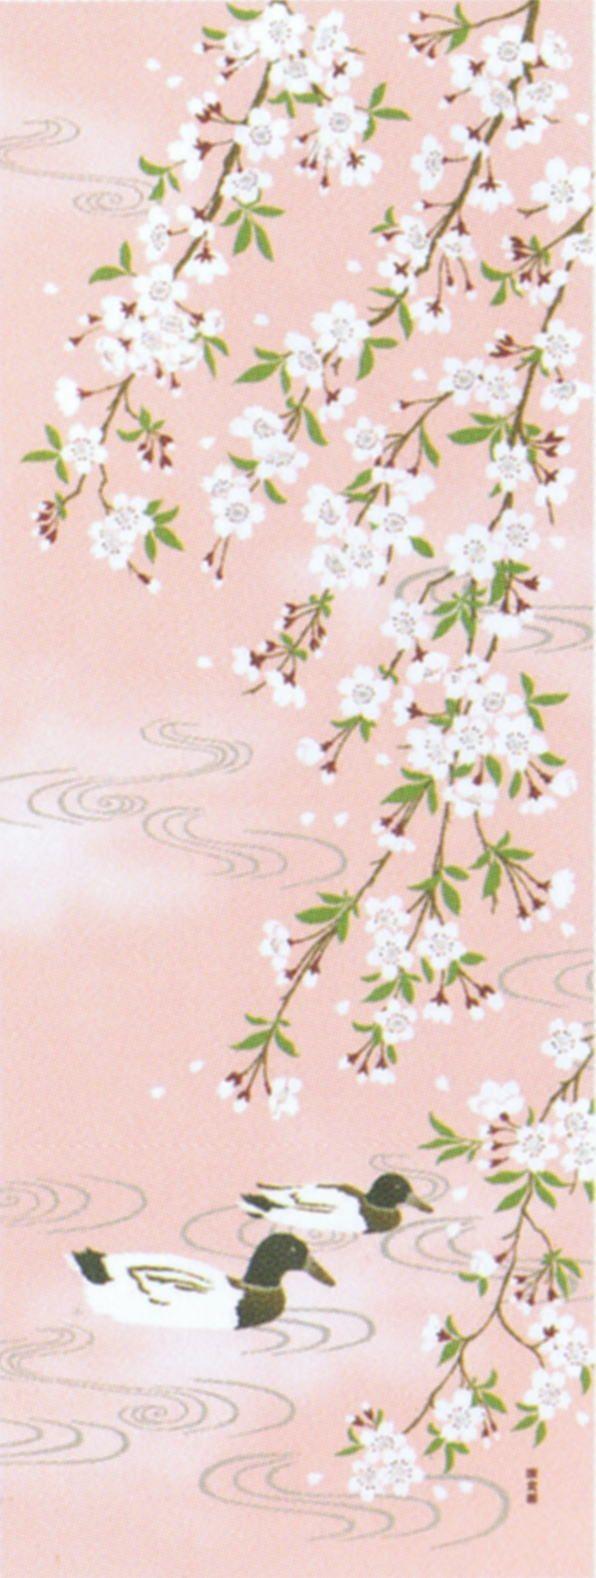 Japanese washcloth, Tenugui 絵てぬぐい 春 夢見桜.jpg